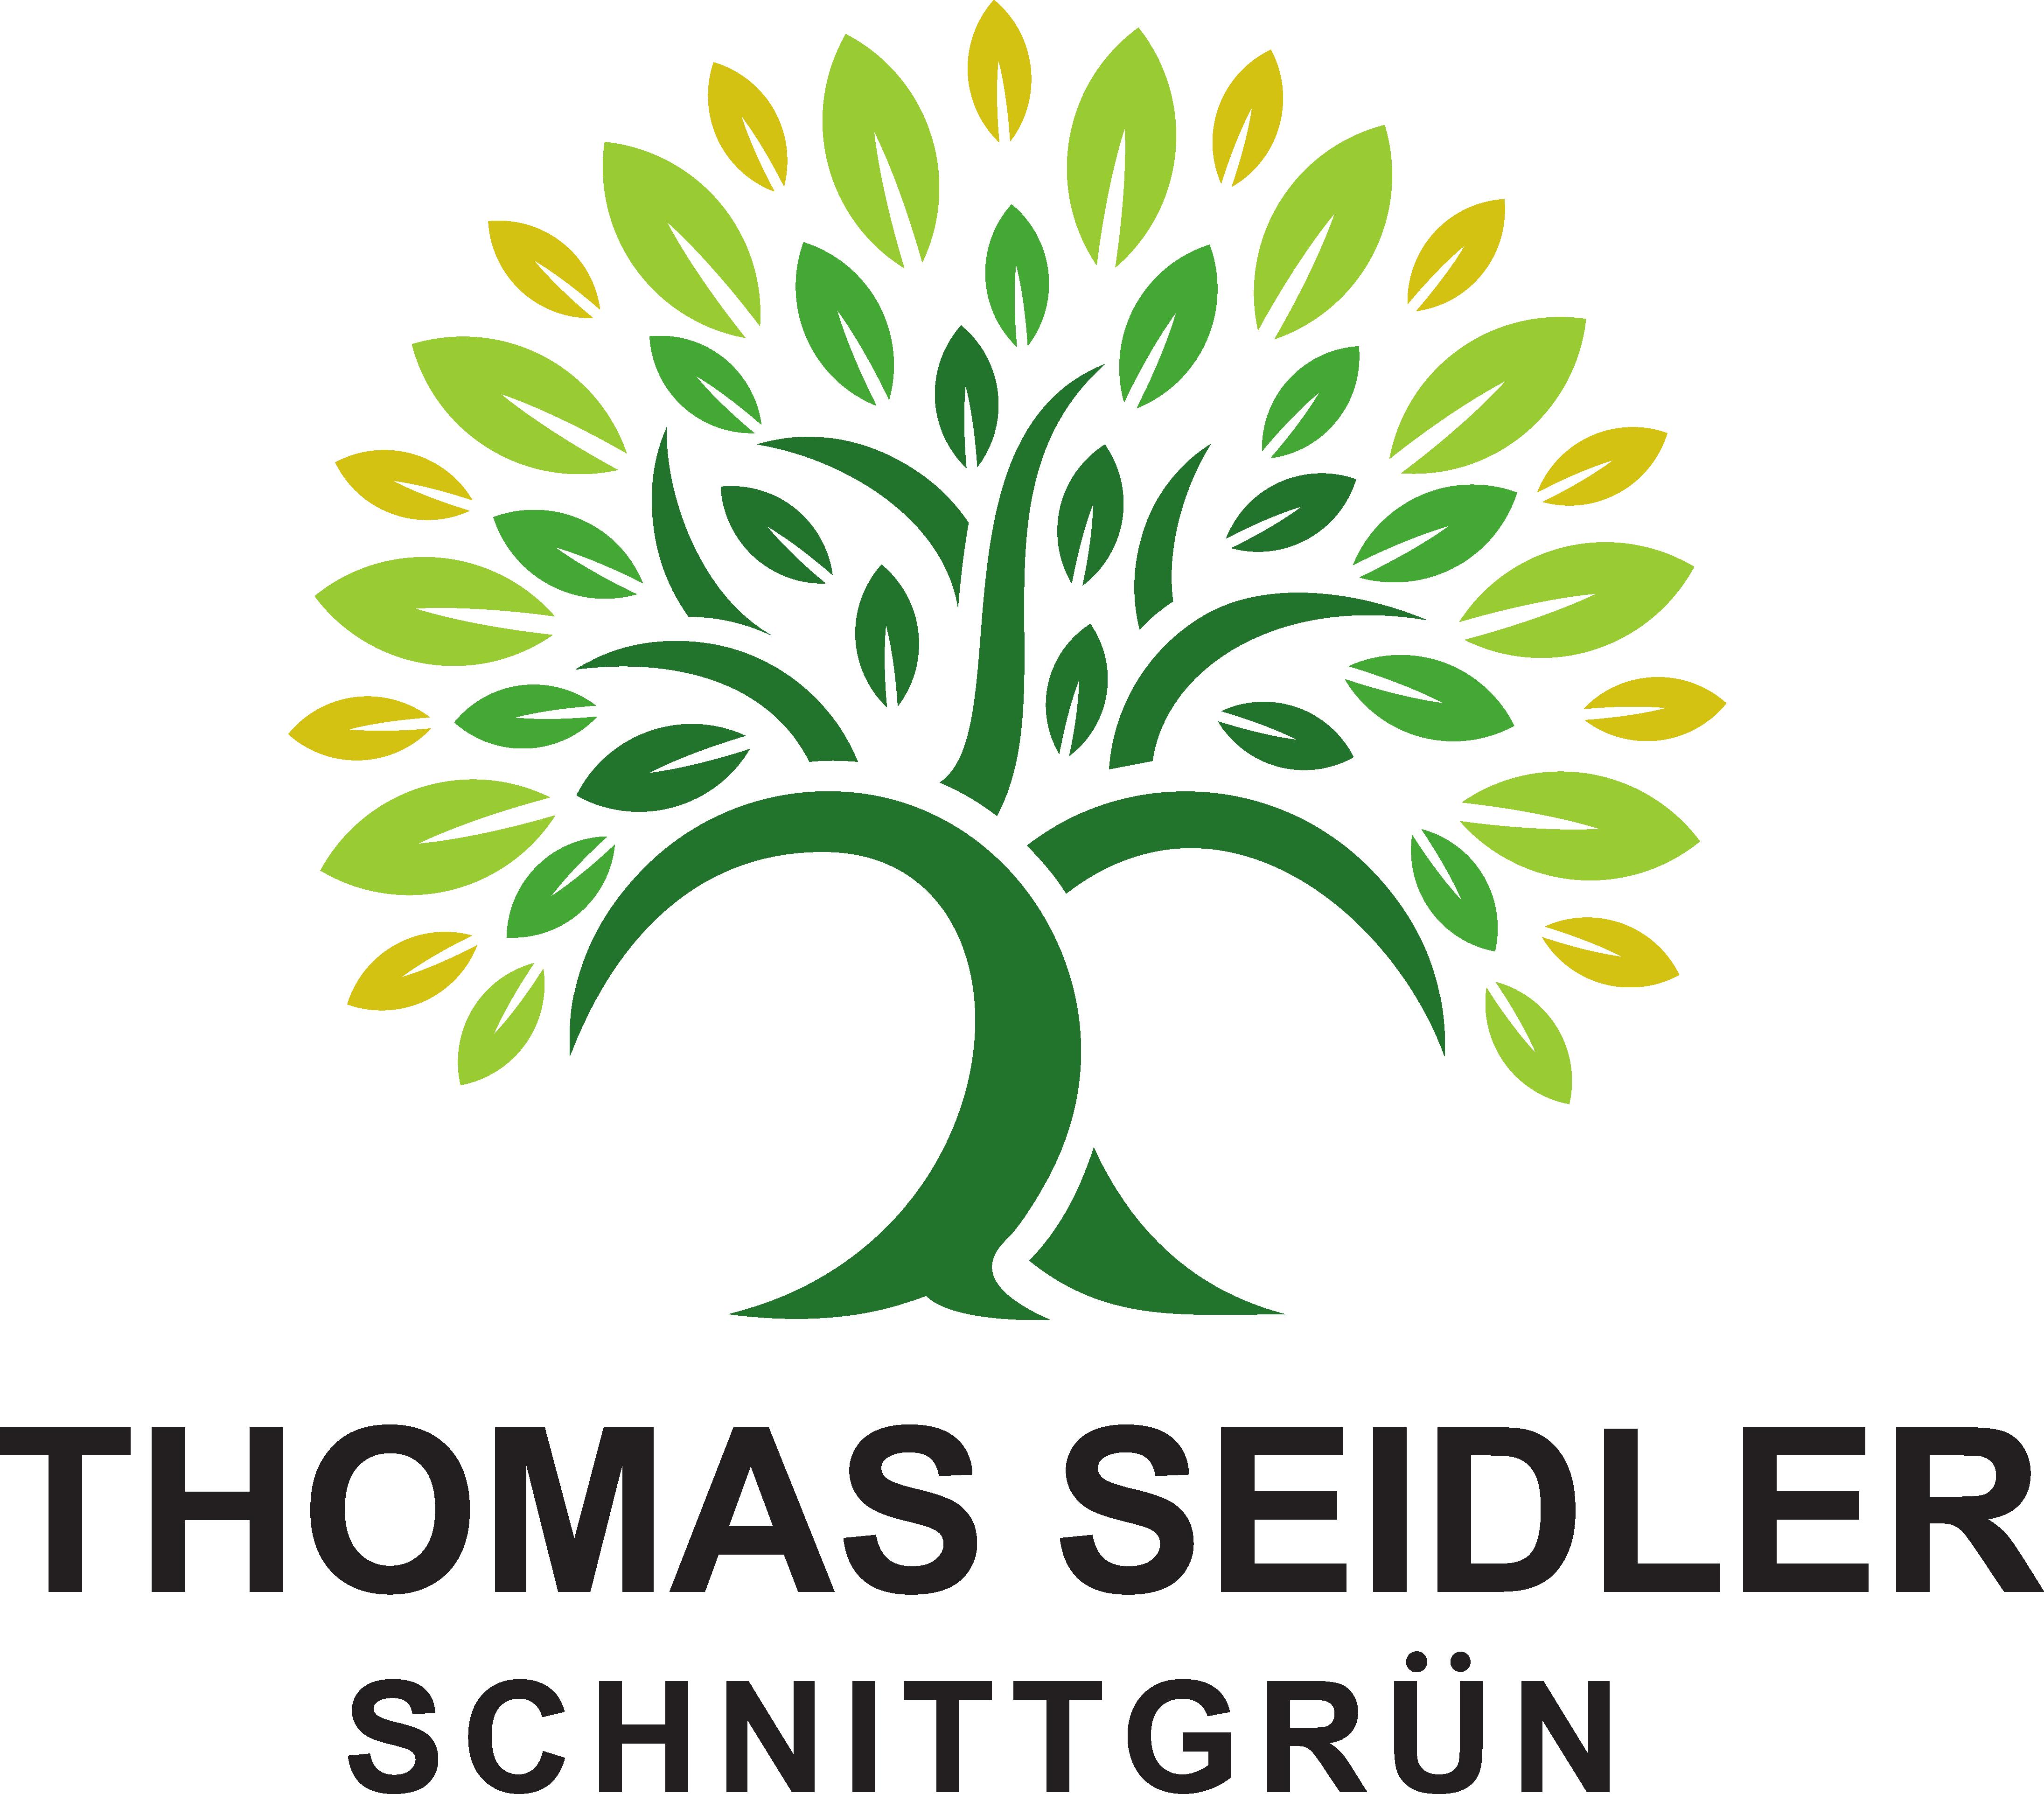 Thomas Seidler Schnittgruen